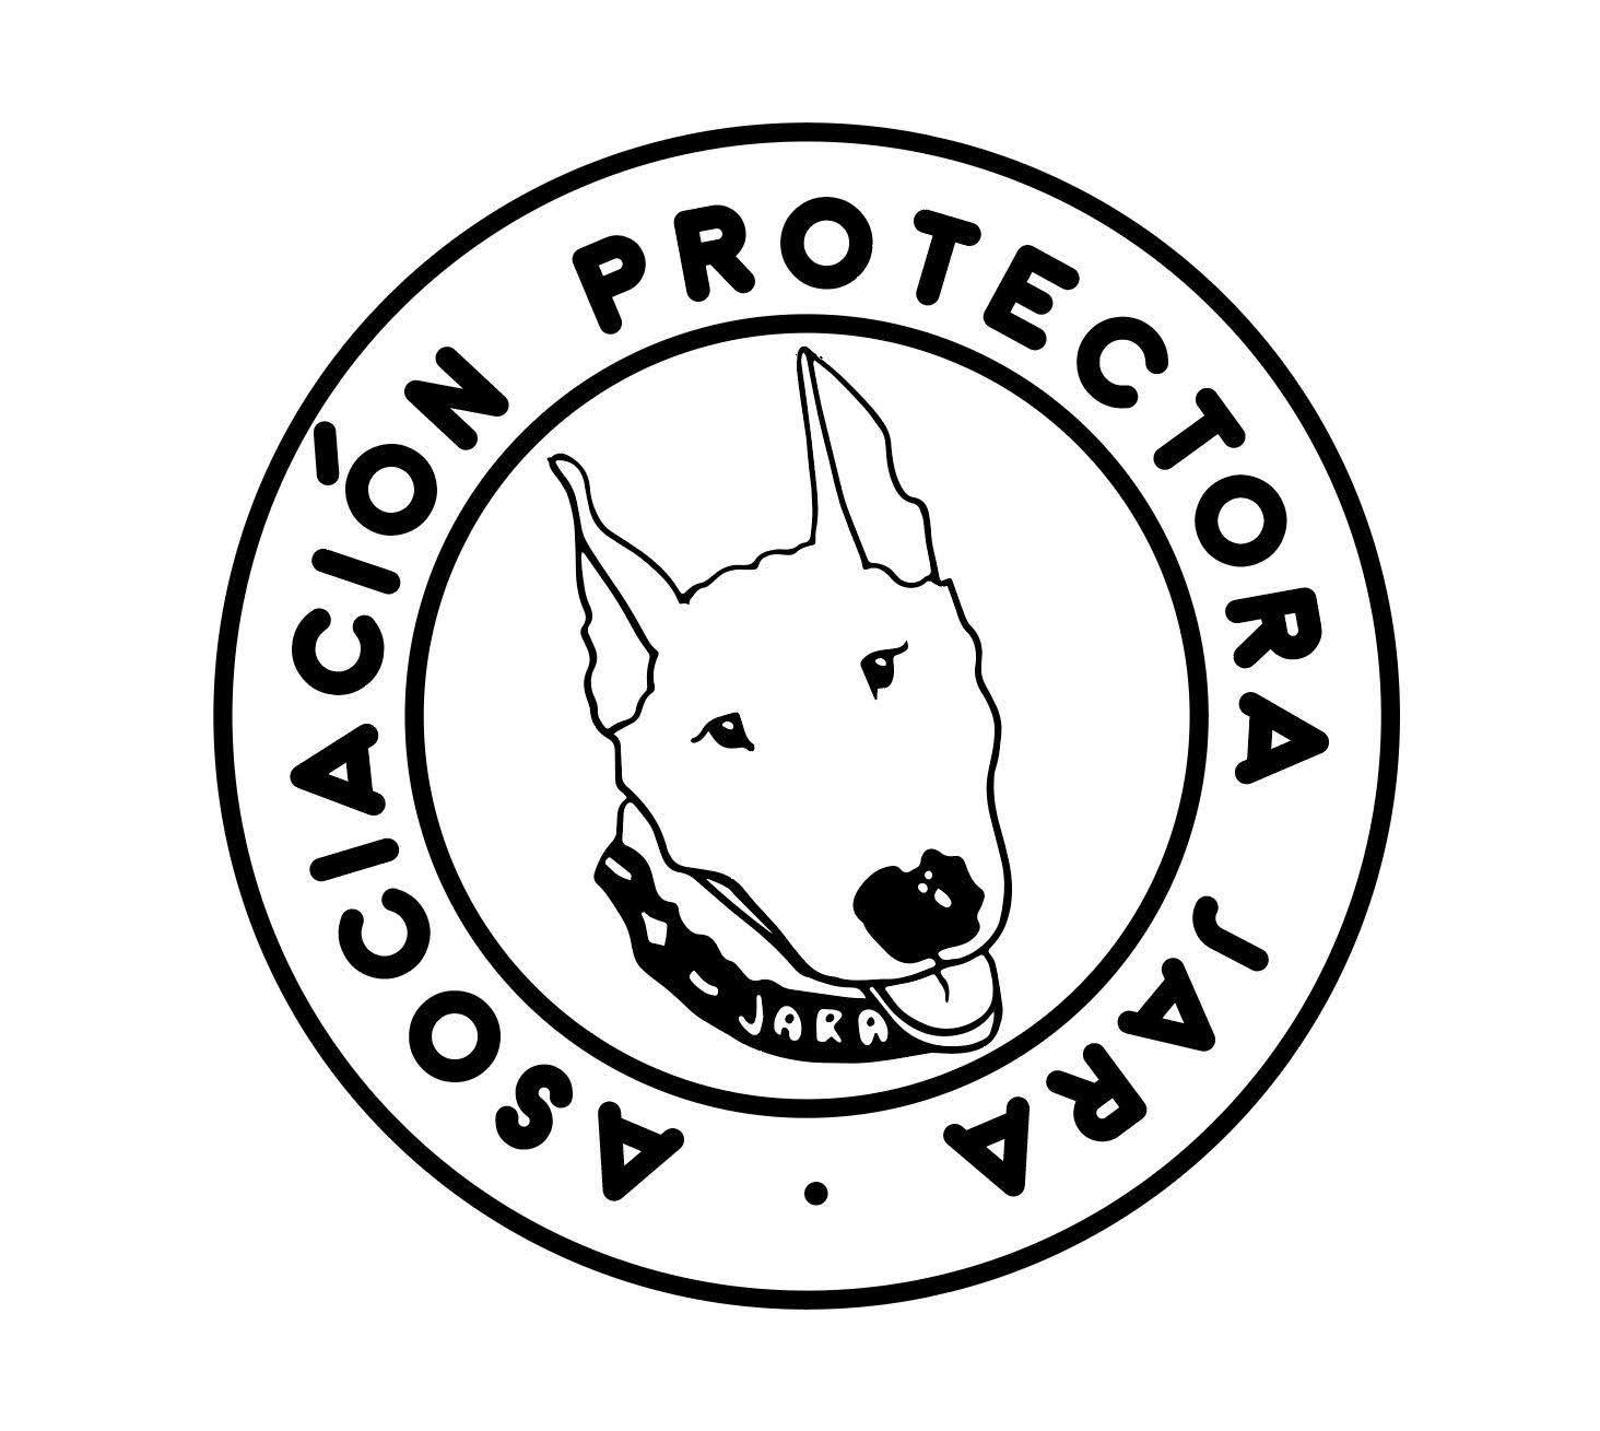 Asociación Protectora Jara